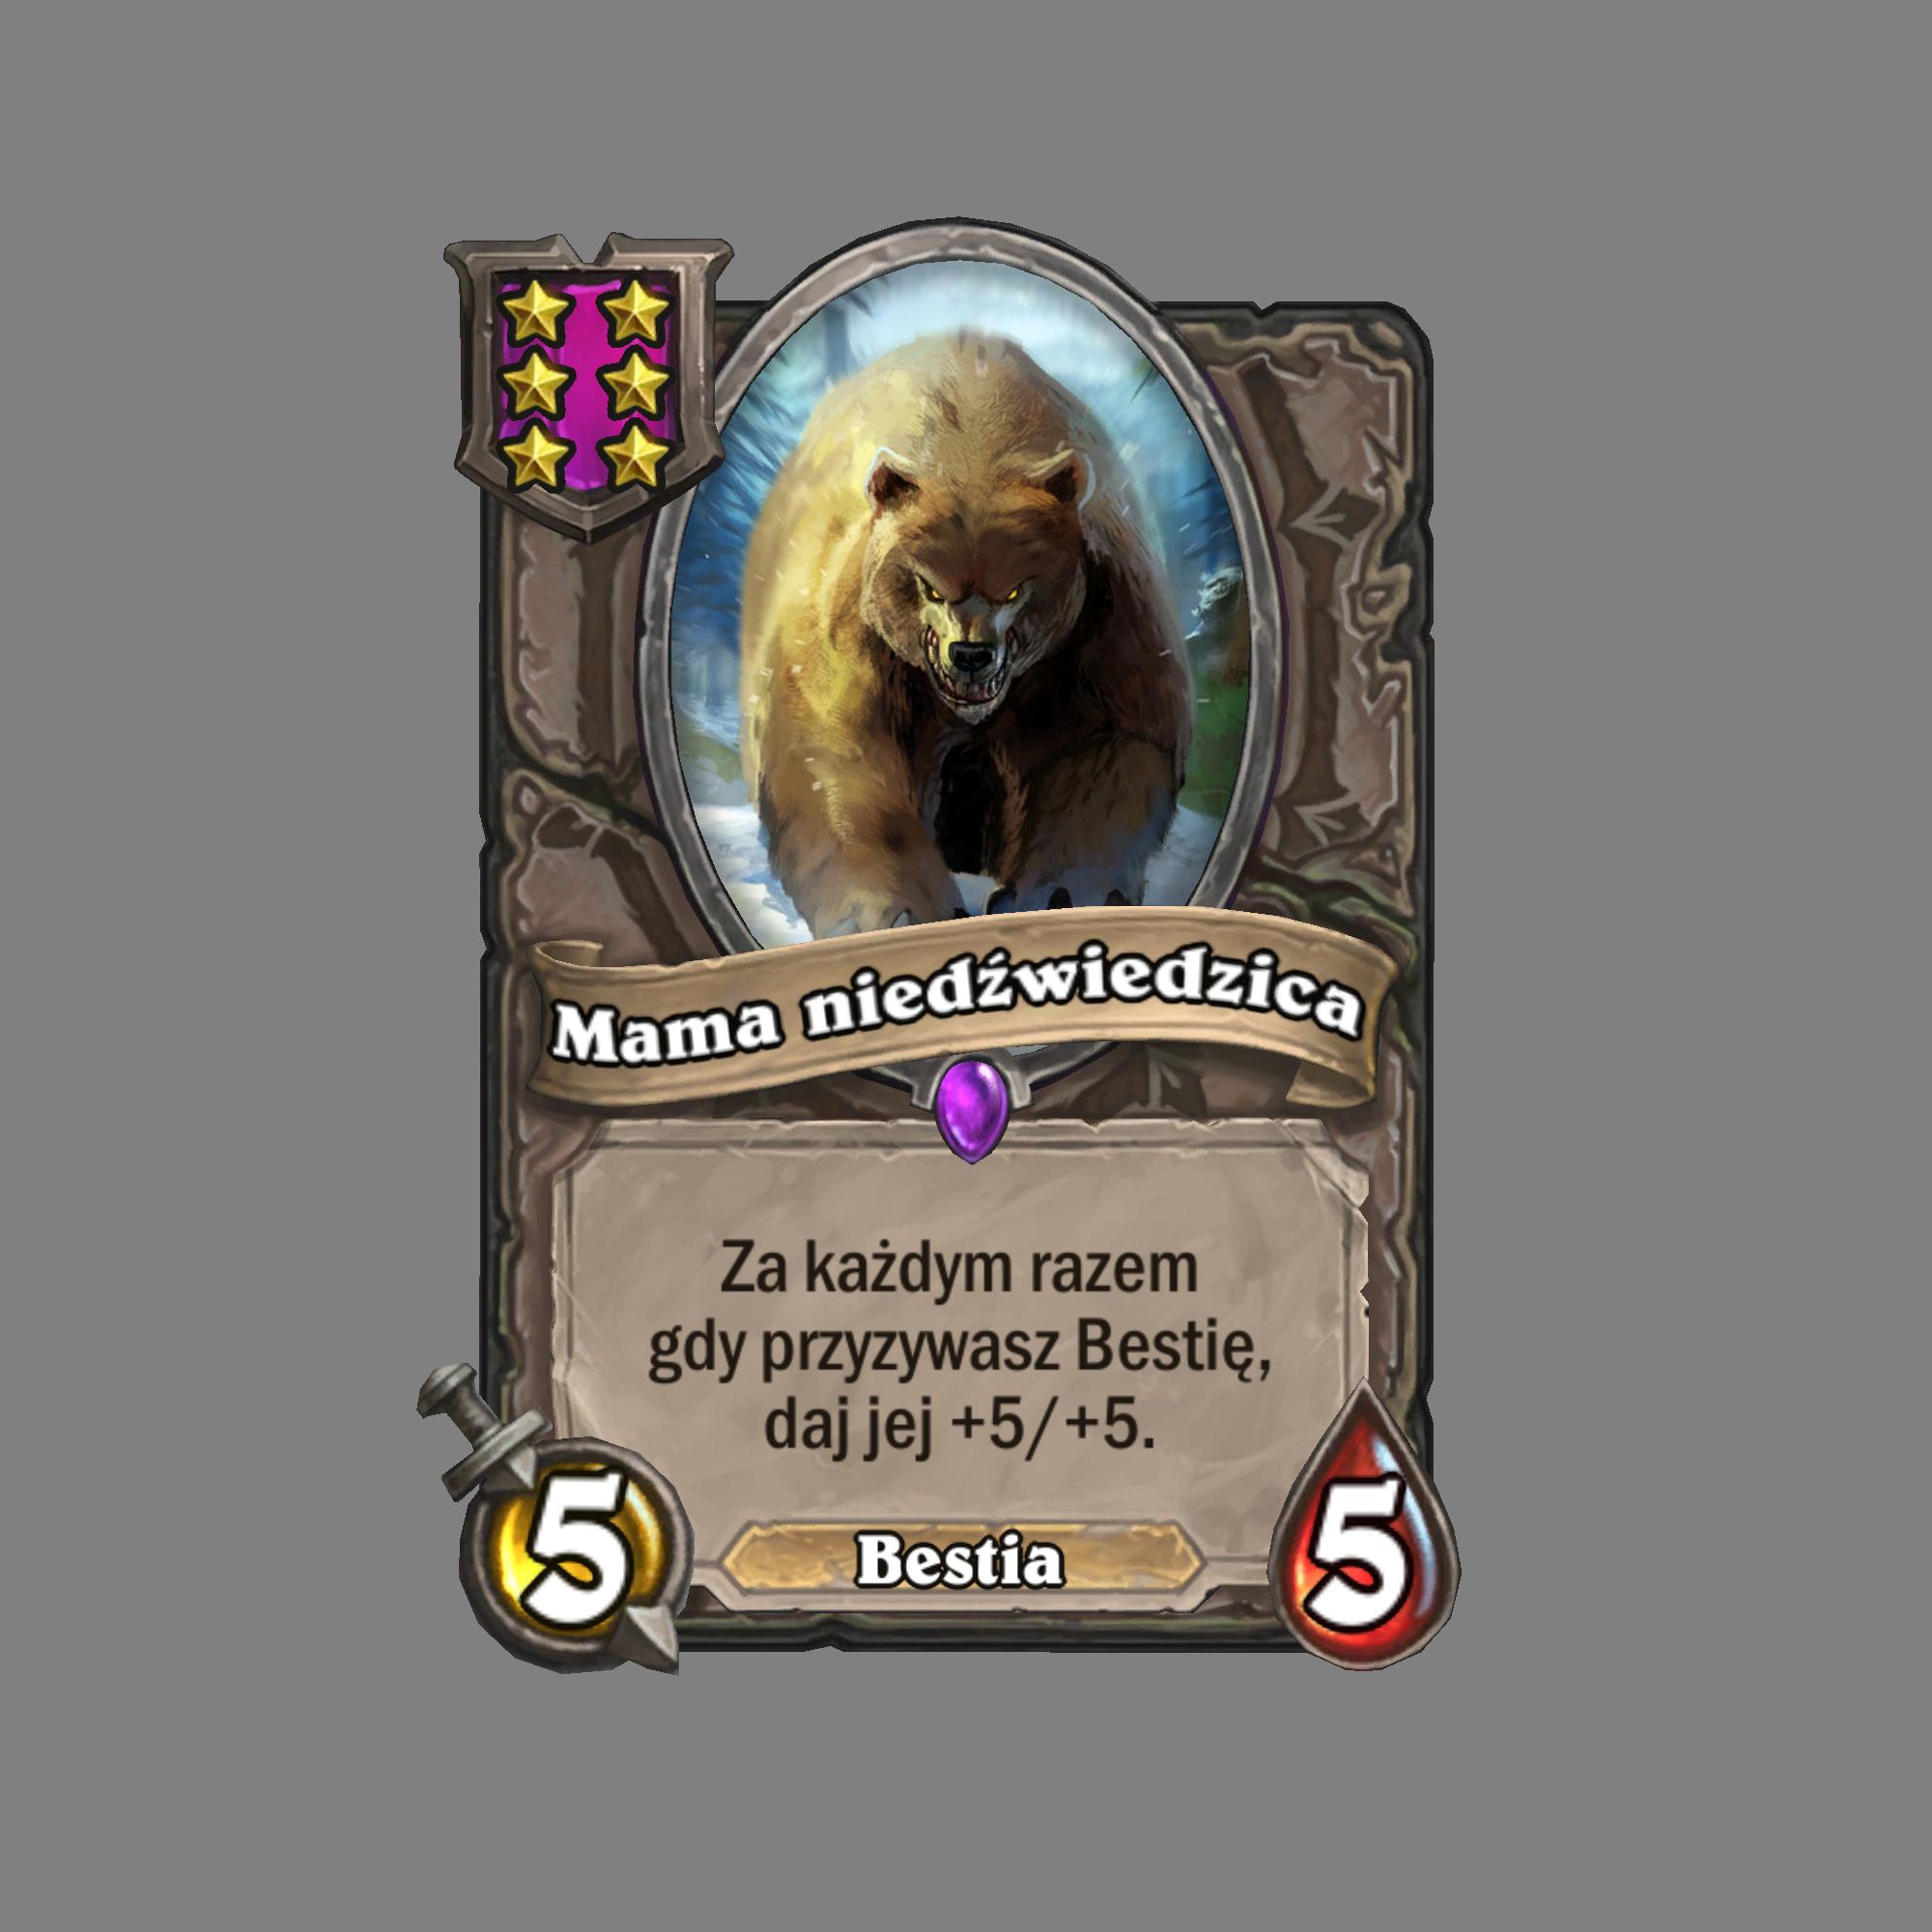 Mama niedźwiedzica